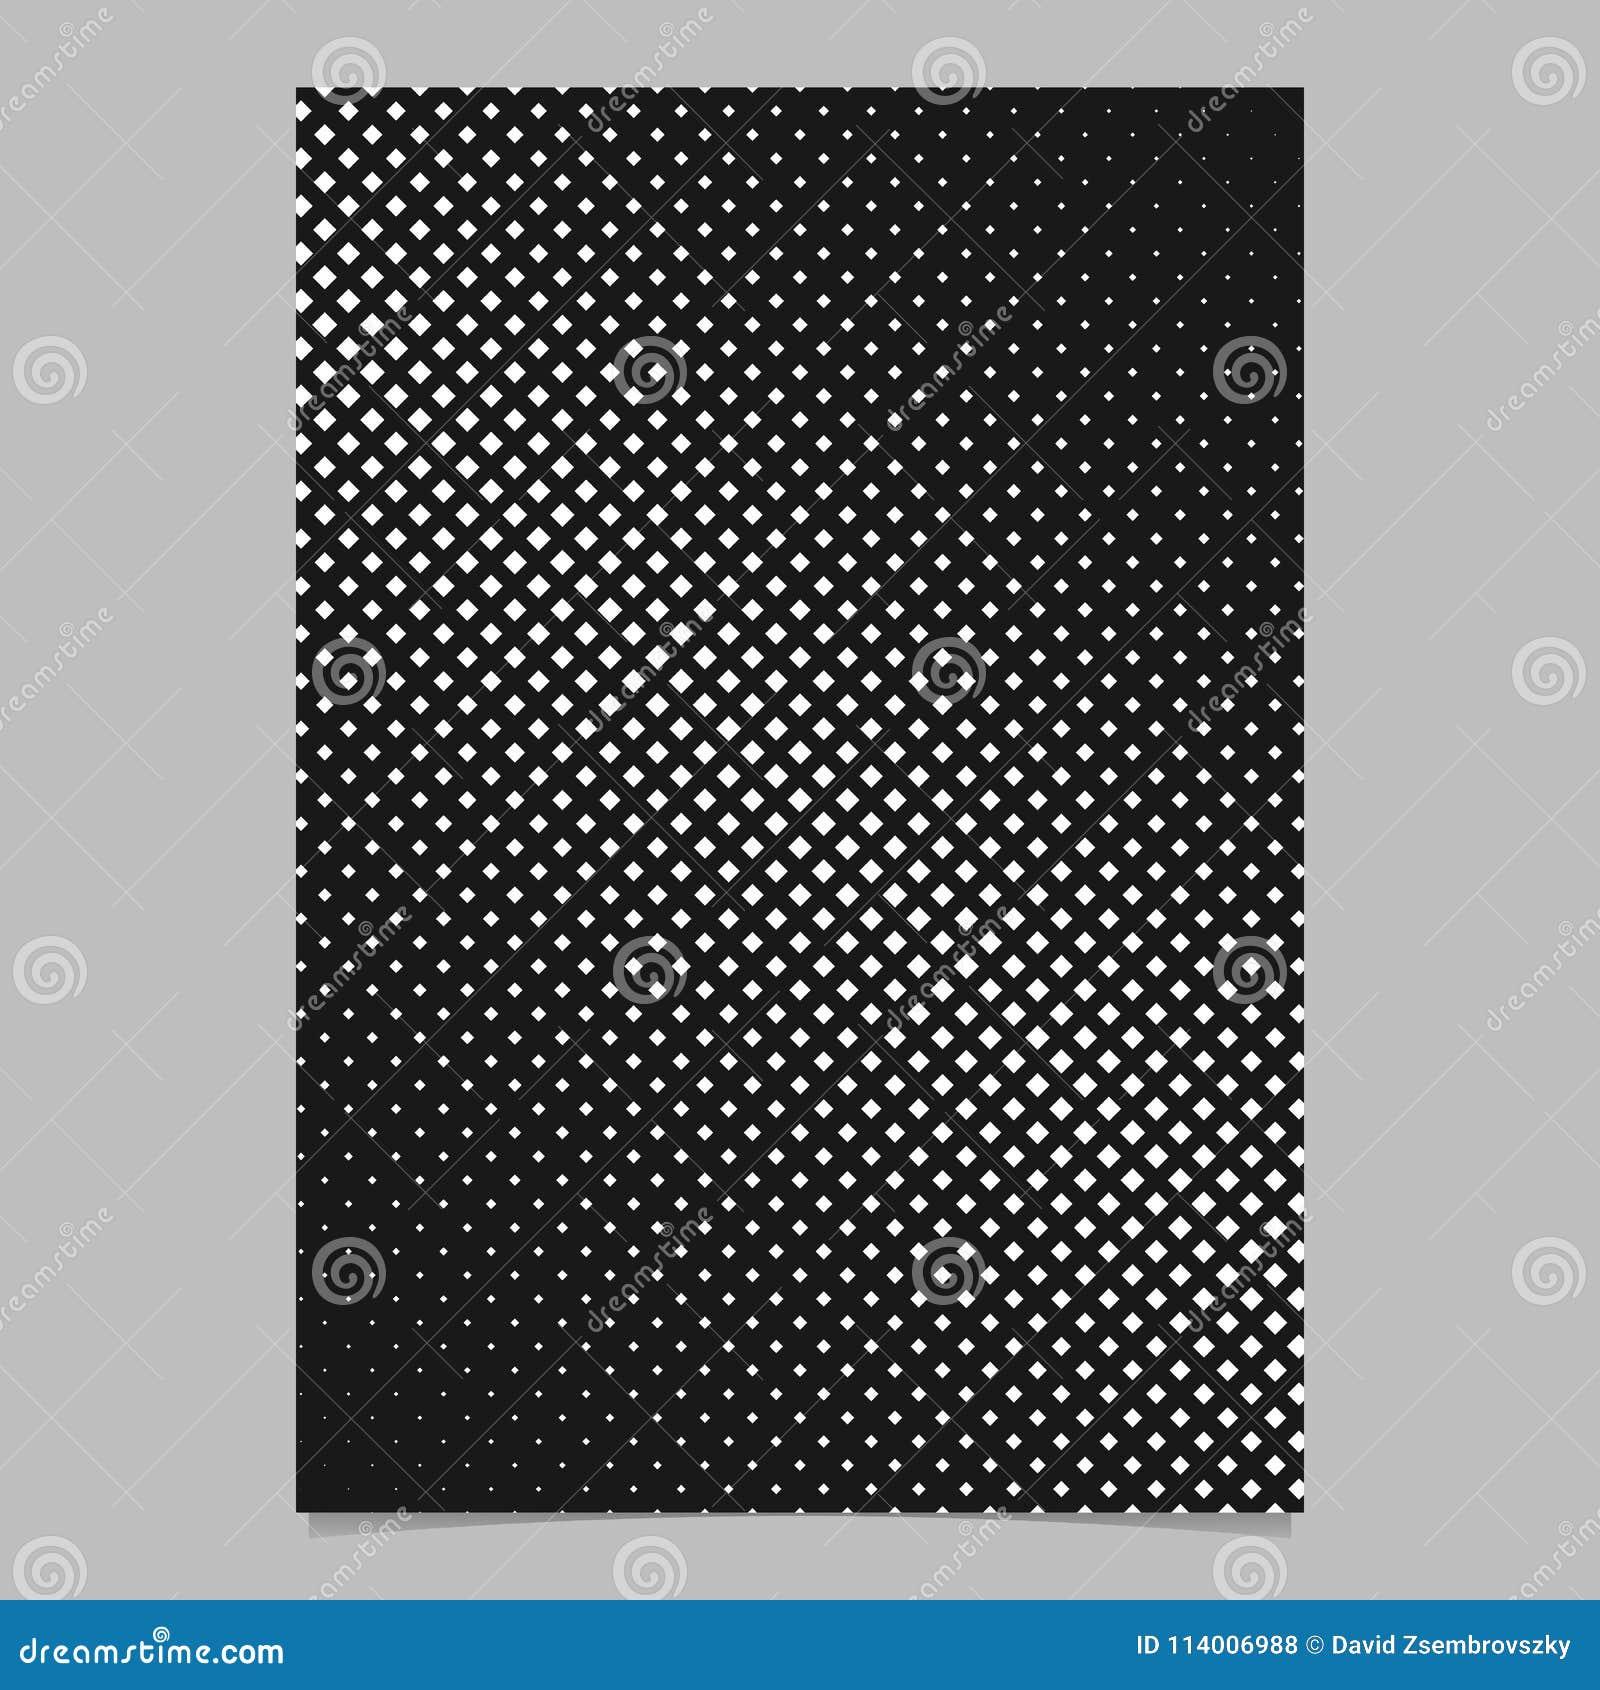 retro halftone diagonal square pattern background brochure design